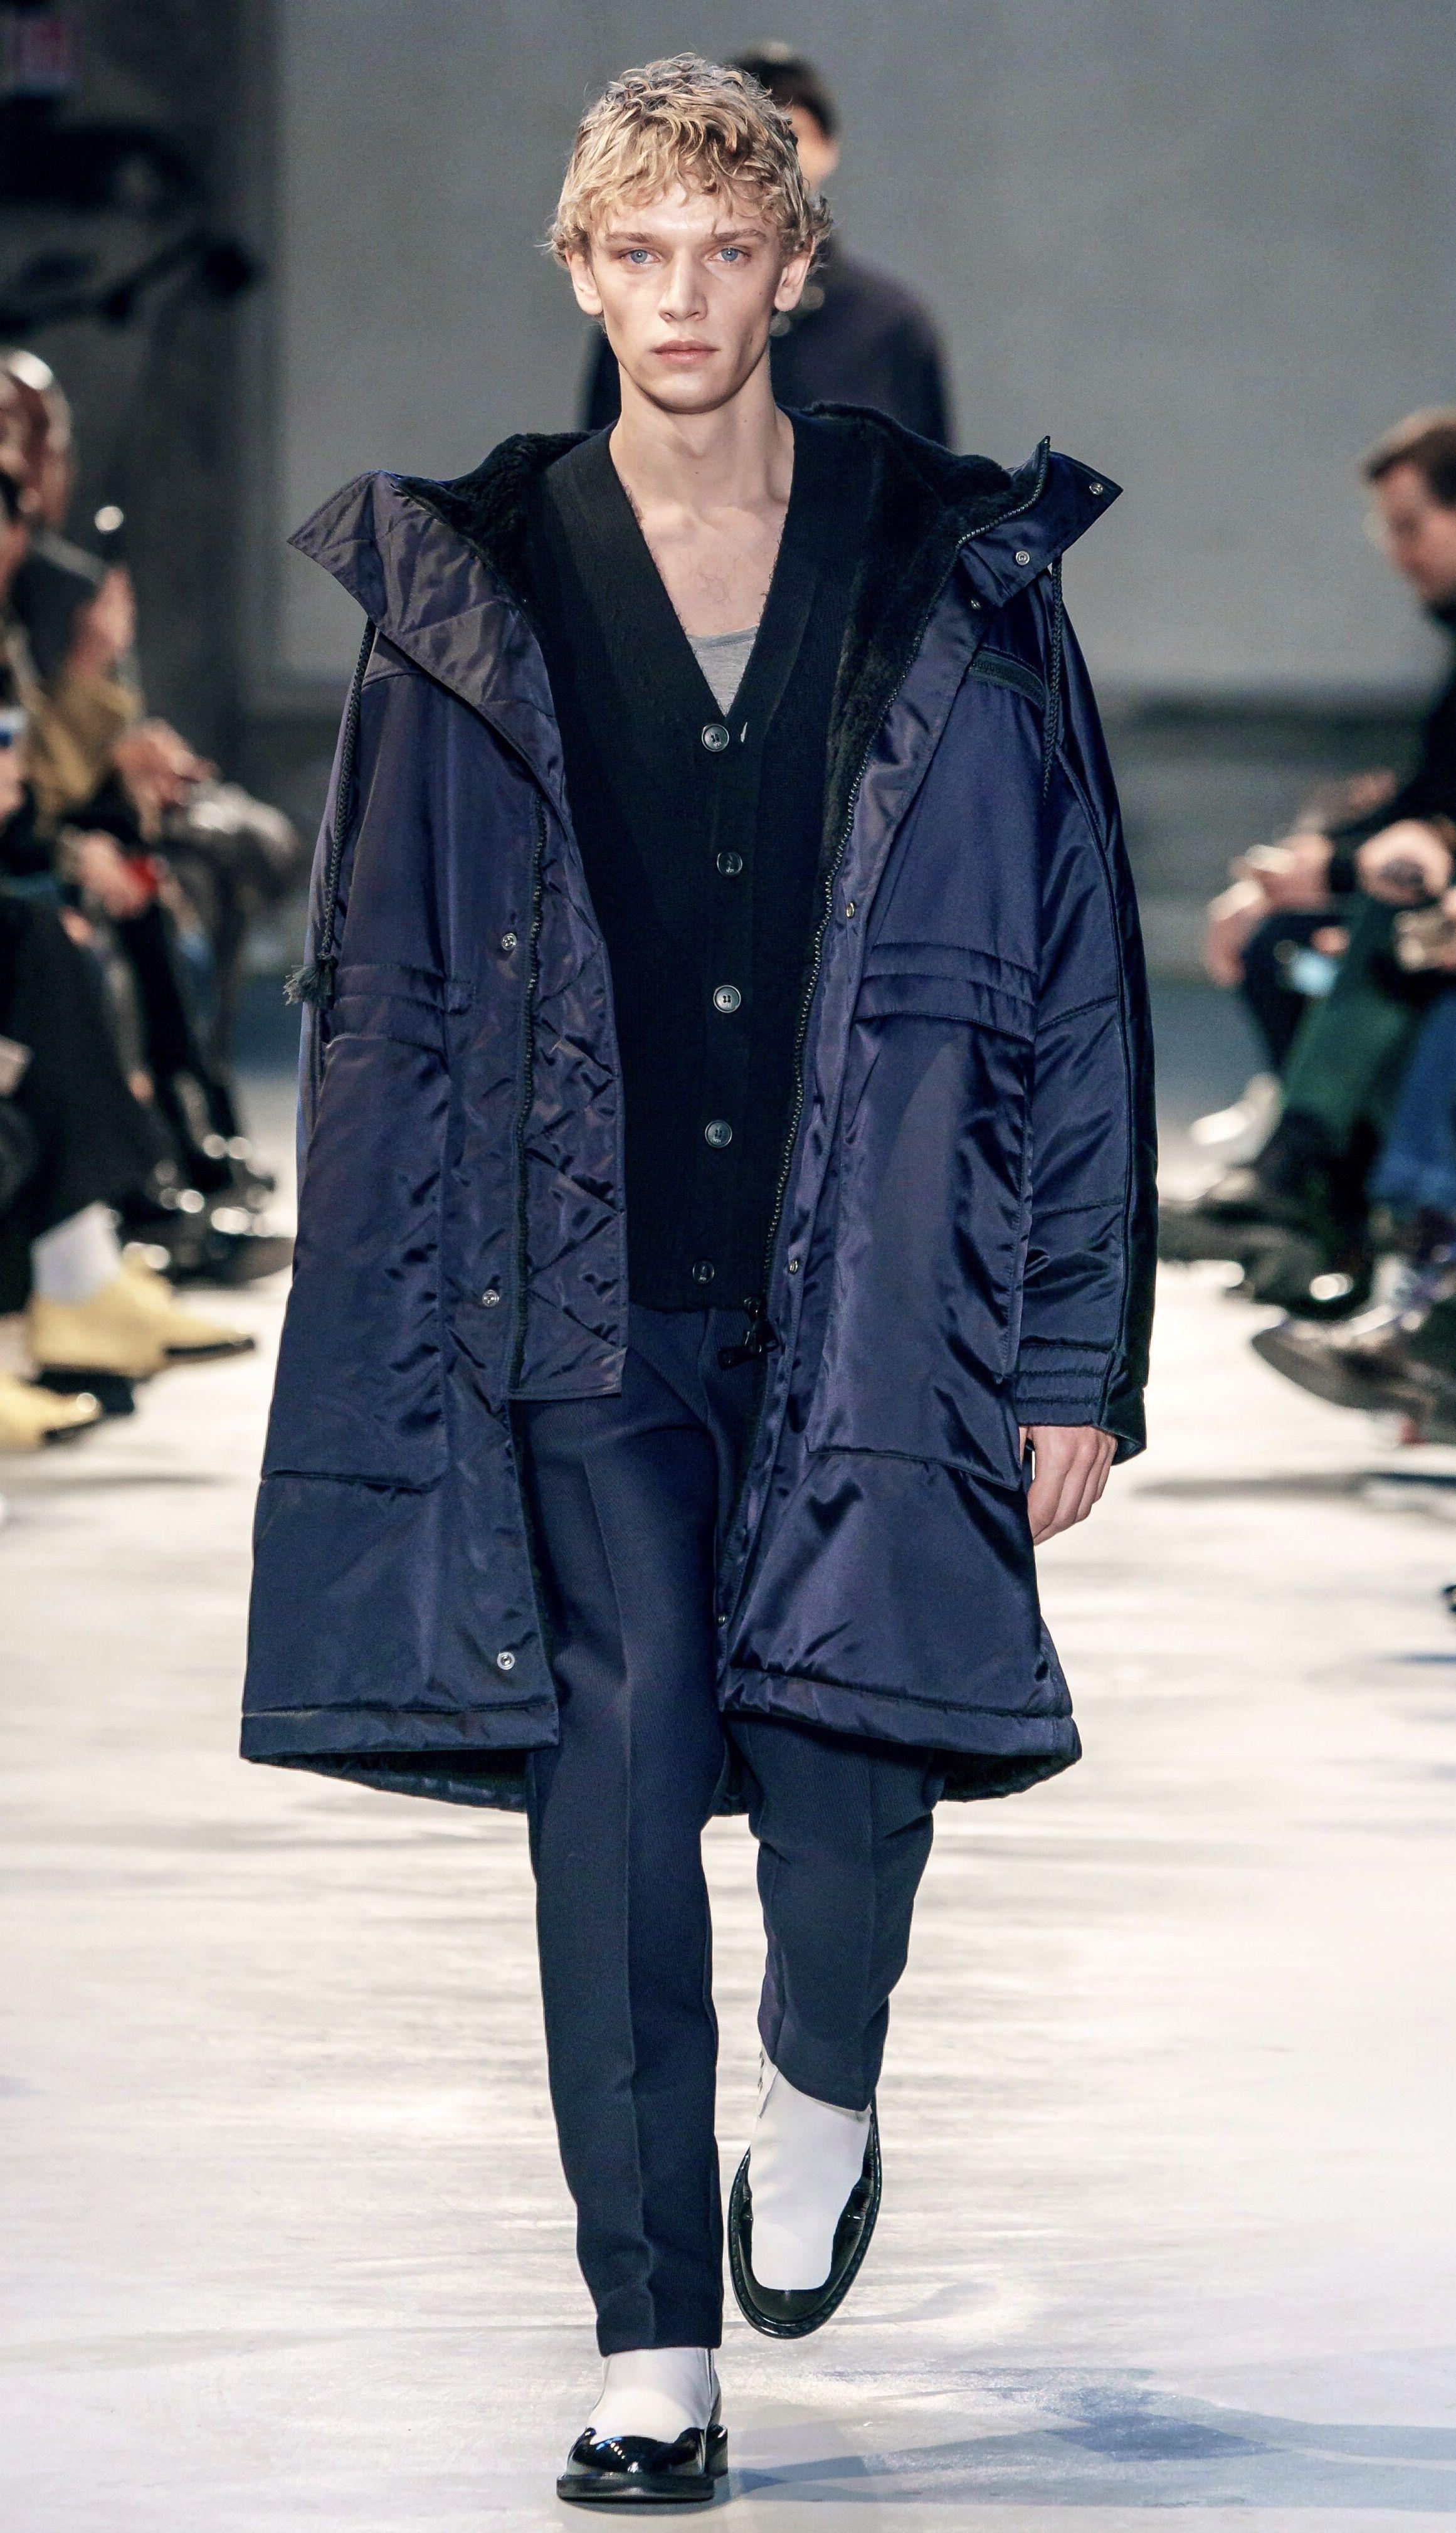 6d0d041ba No. 21 Fall 2019 Menswear Look #19 featuring Peter DuPont | MENS ...